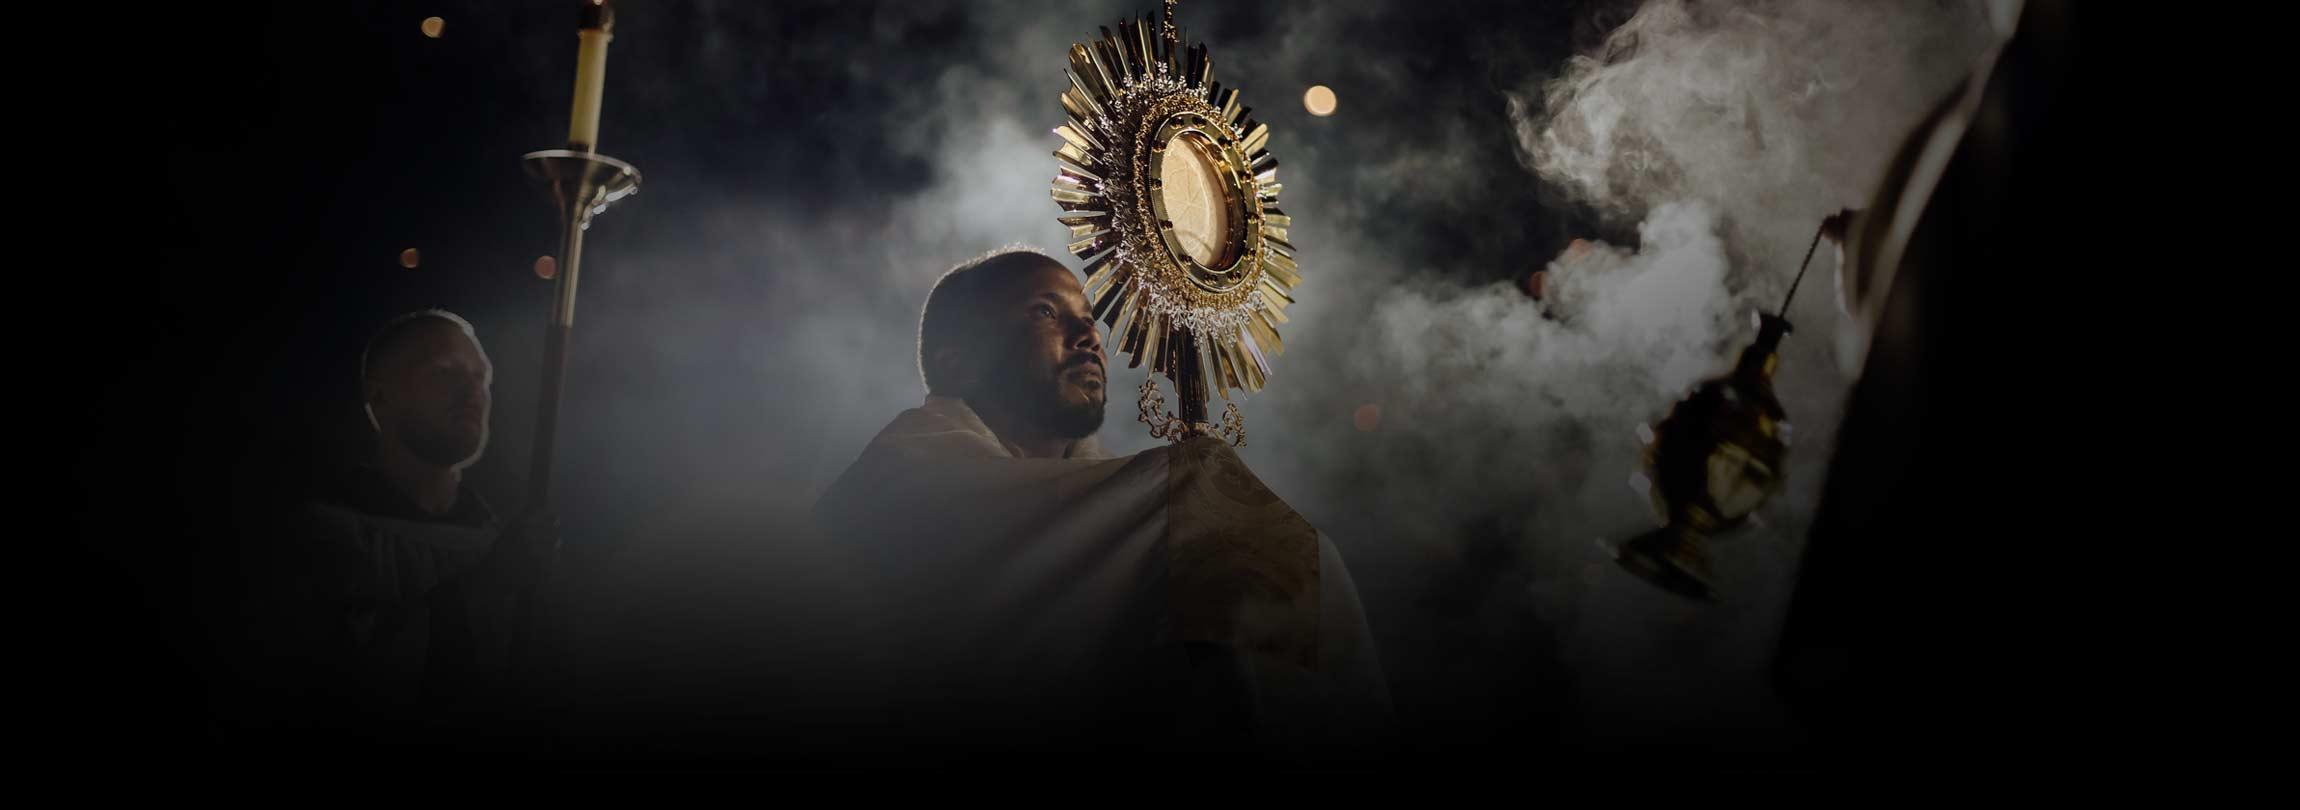 Vejo vocês na Eucaristia